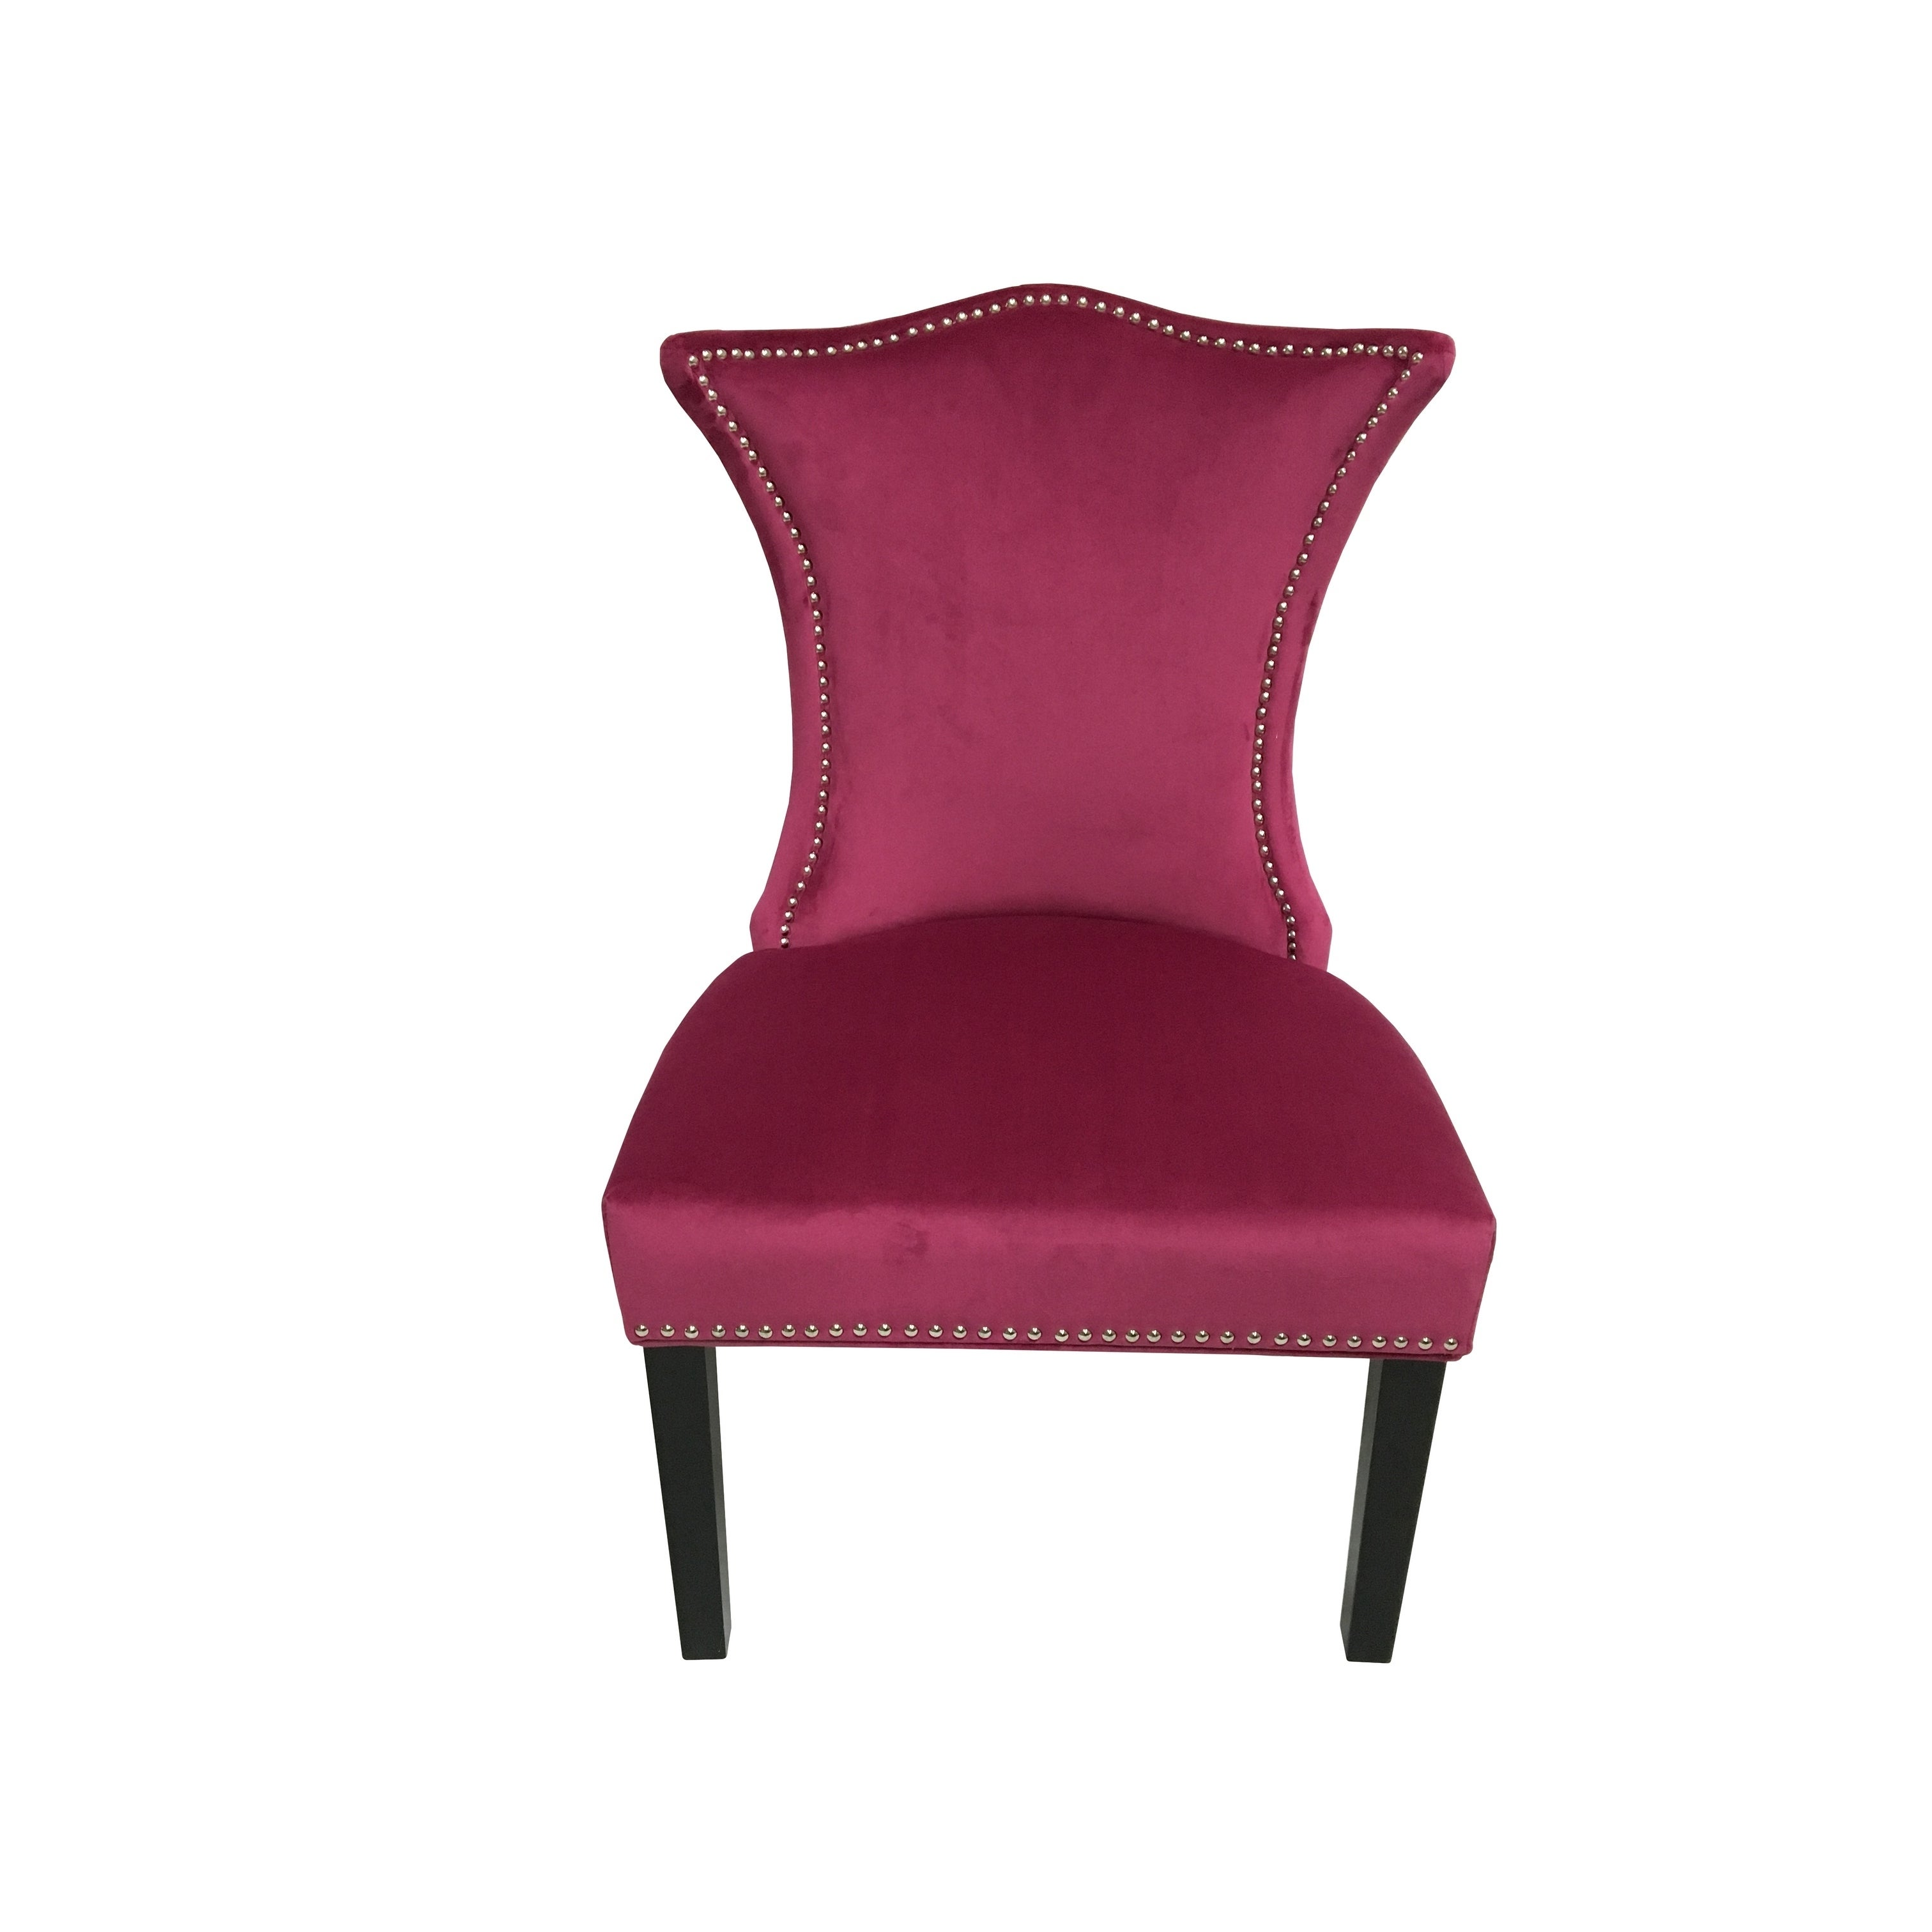 HD Couture Linda Chair Raspberry, China (Birch)